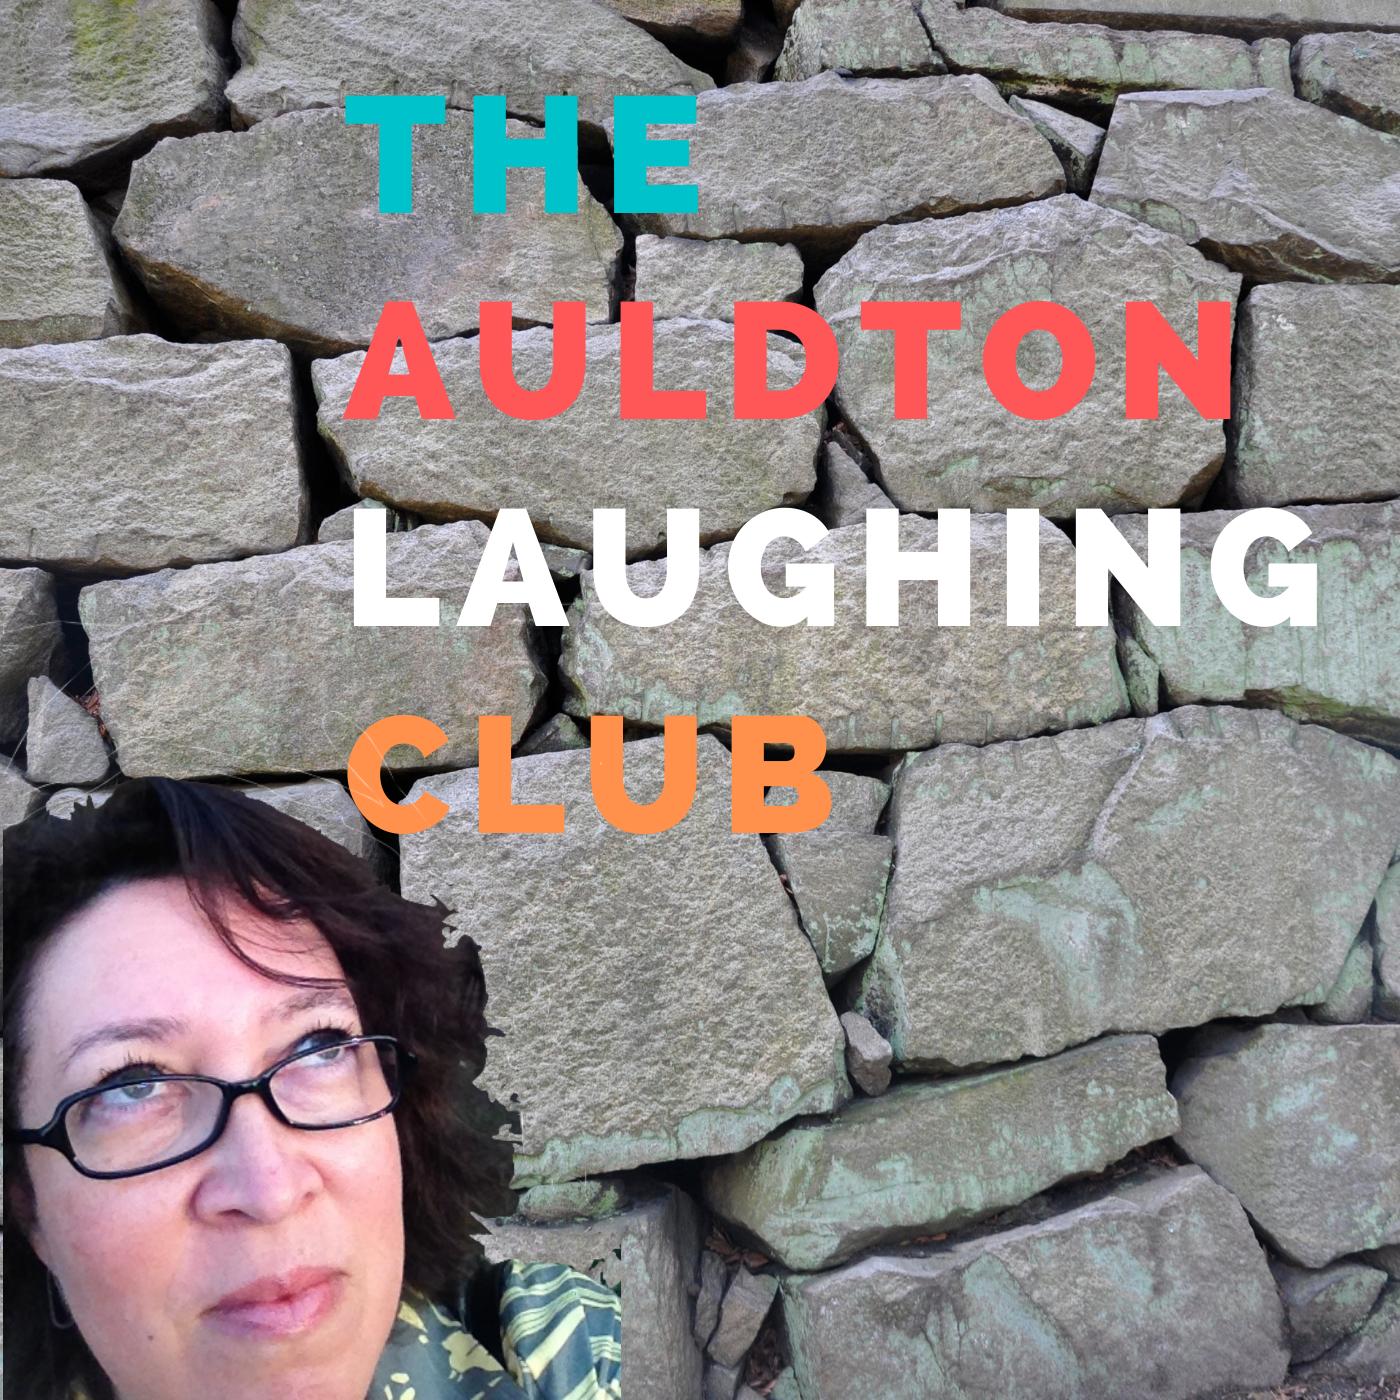 Auldton Laughing Club show art